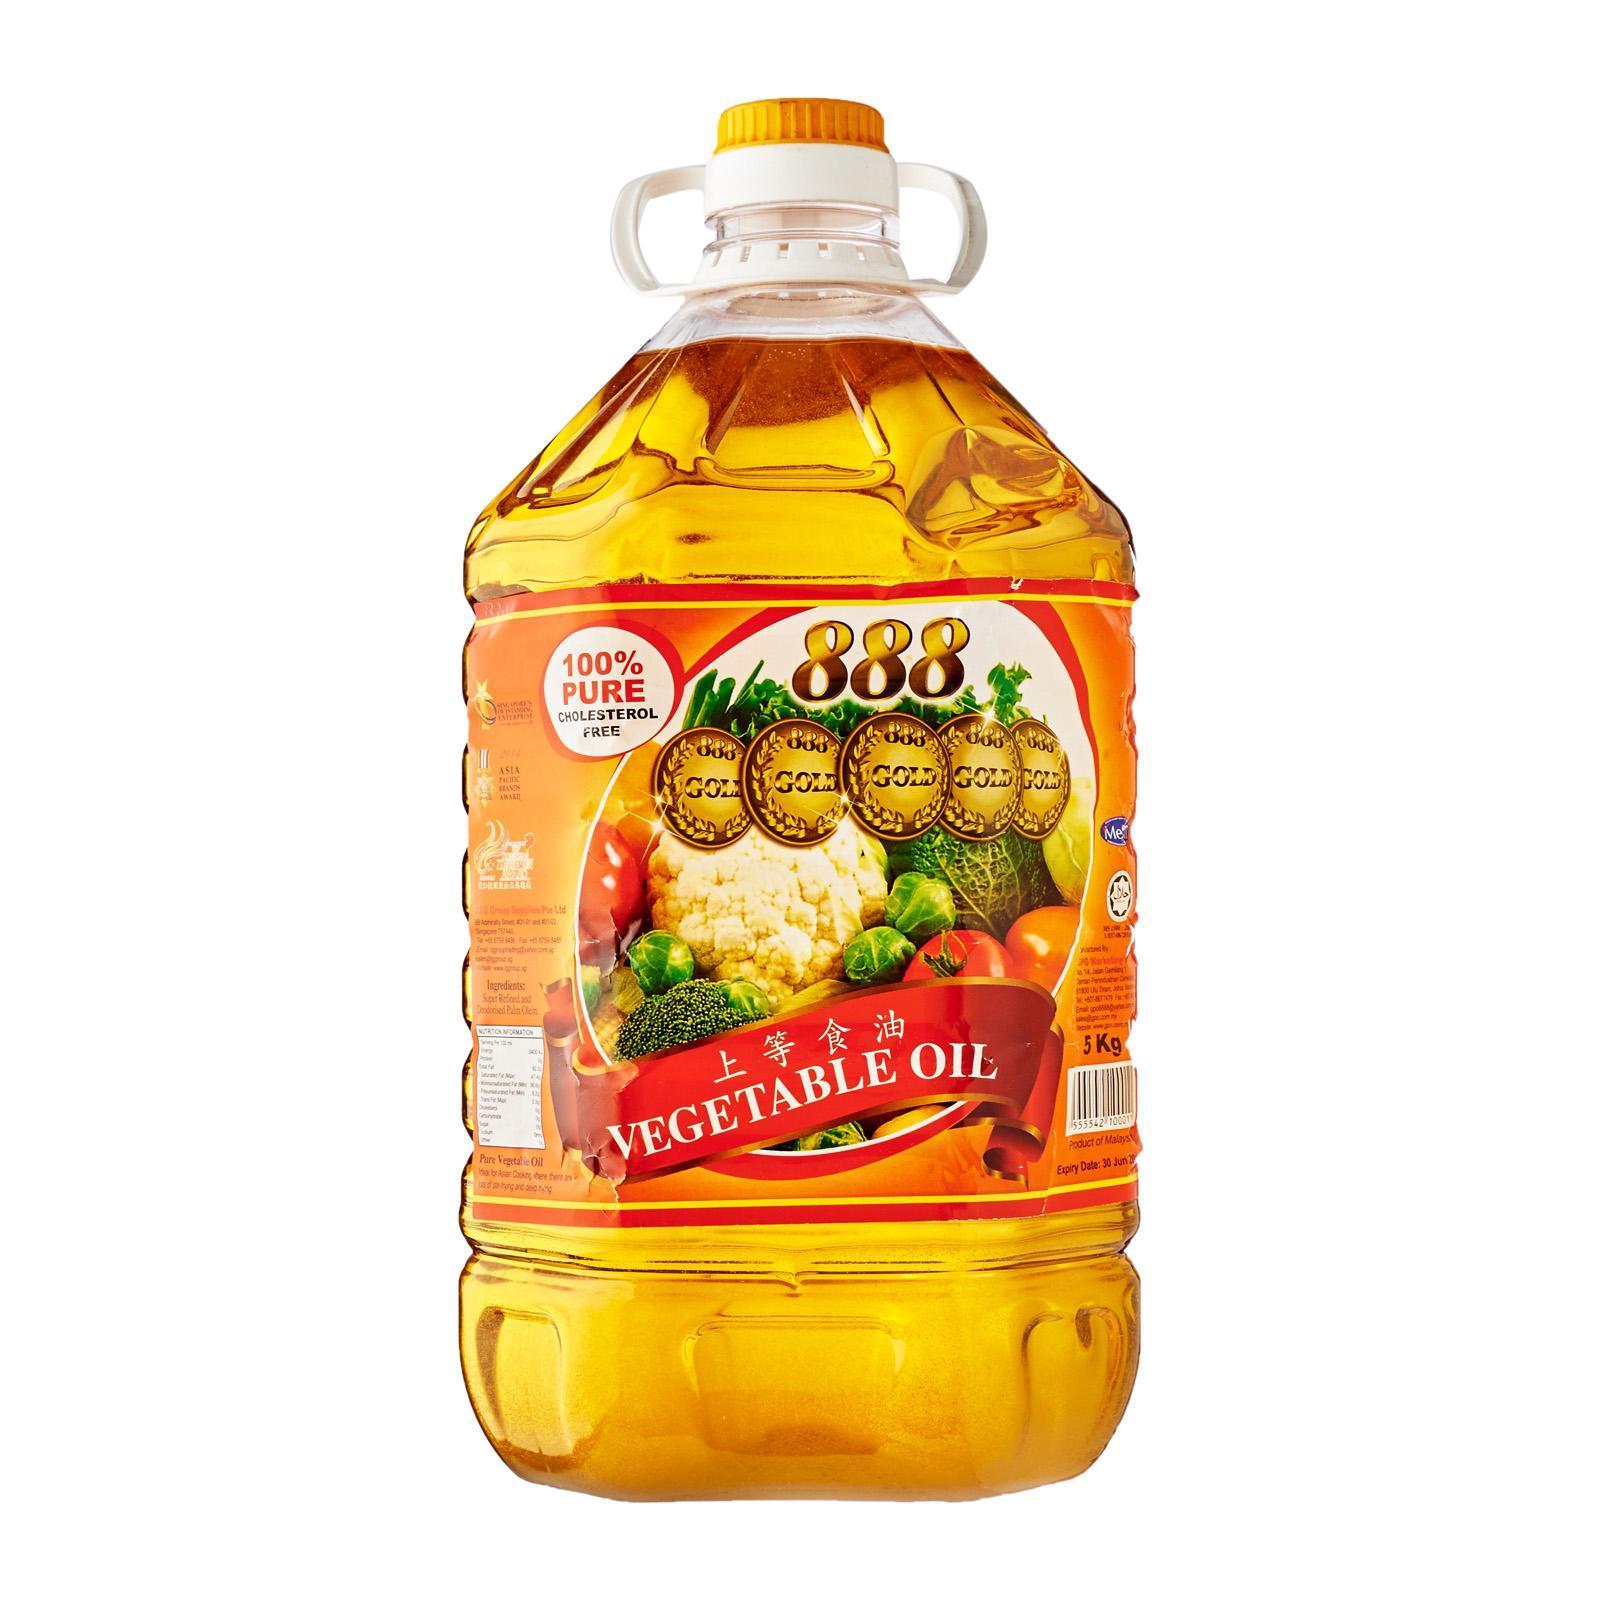 Premium Cooking Vegetable Oil 5kg - By Food Service By Redmart.